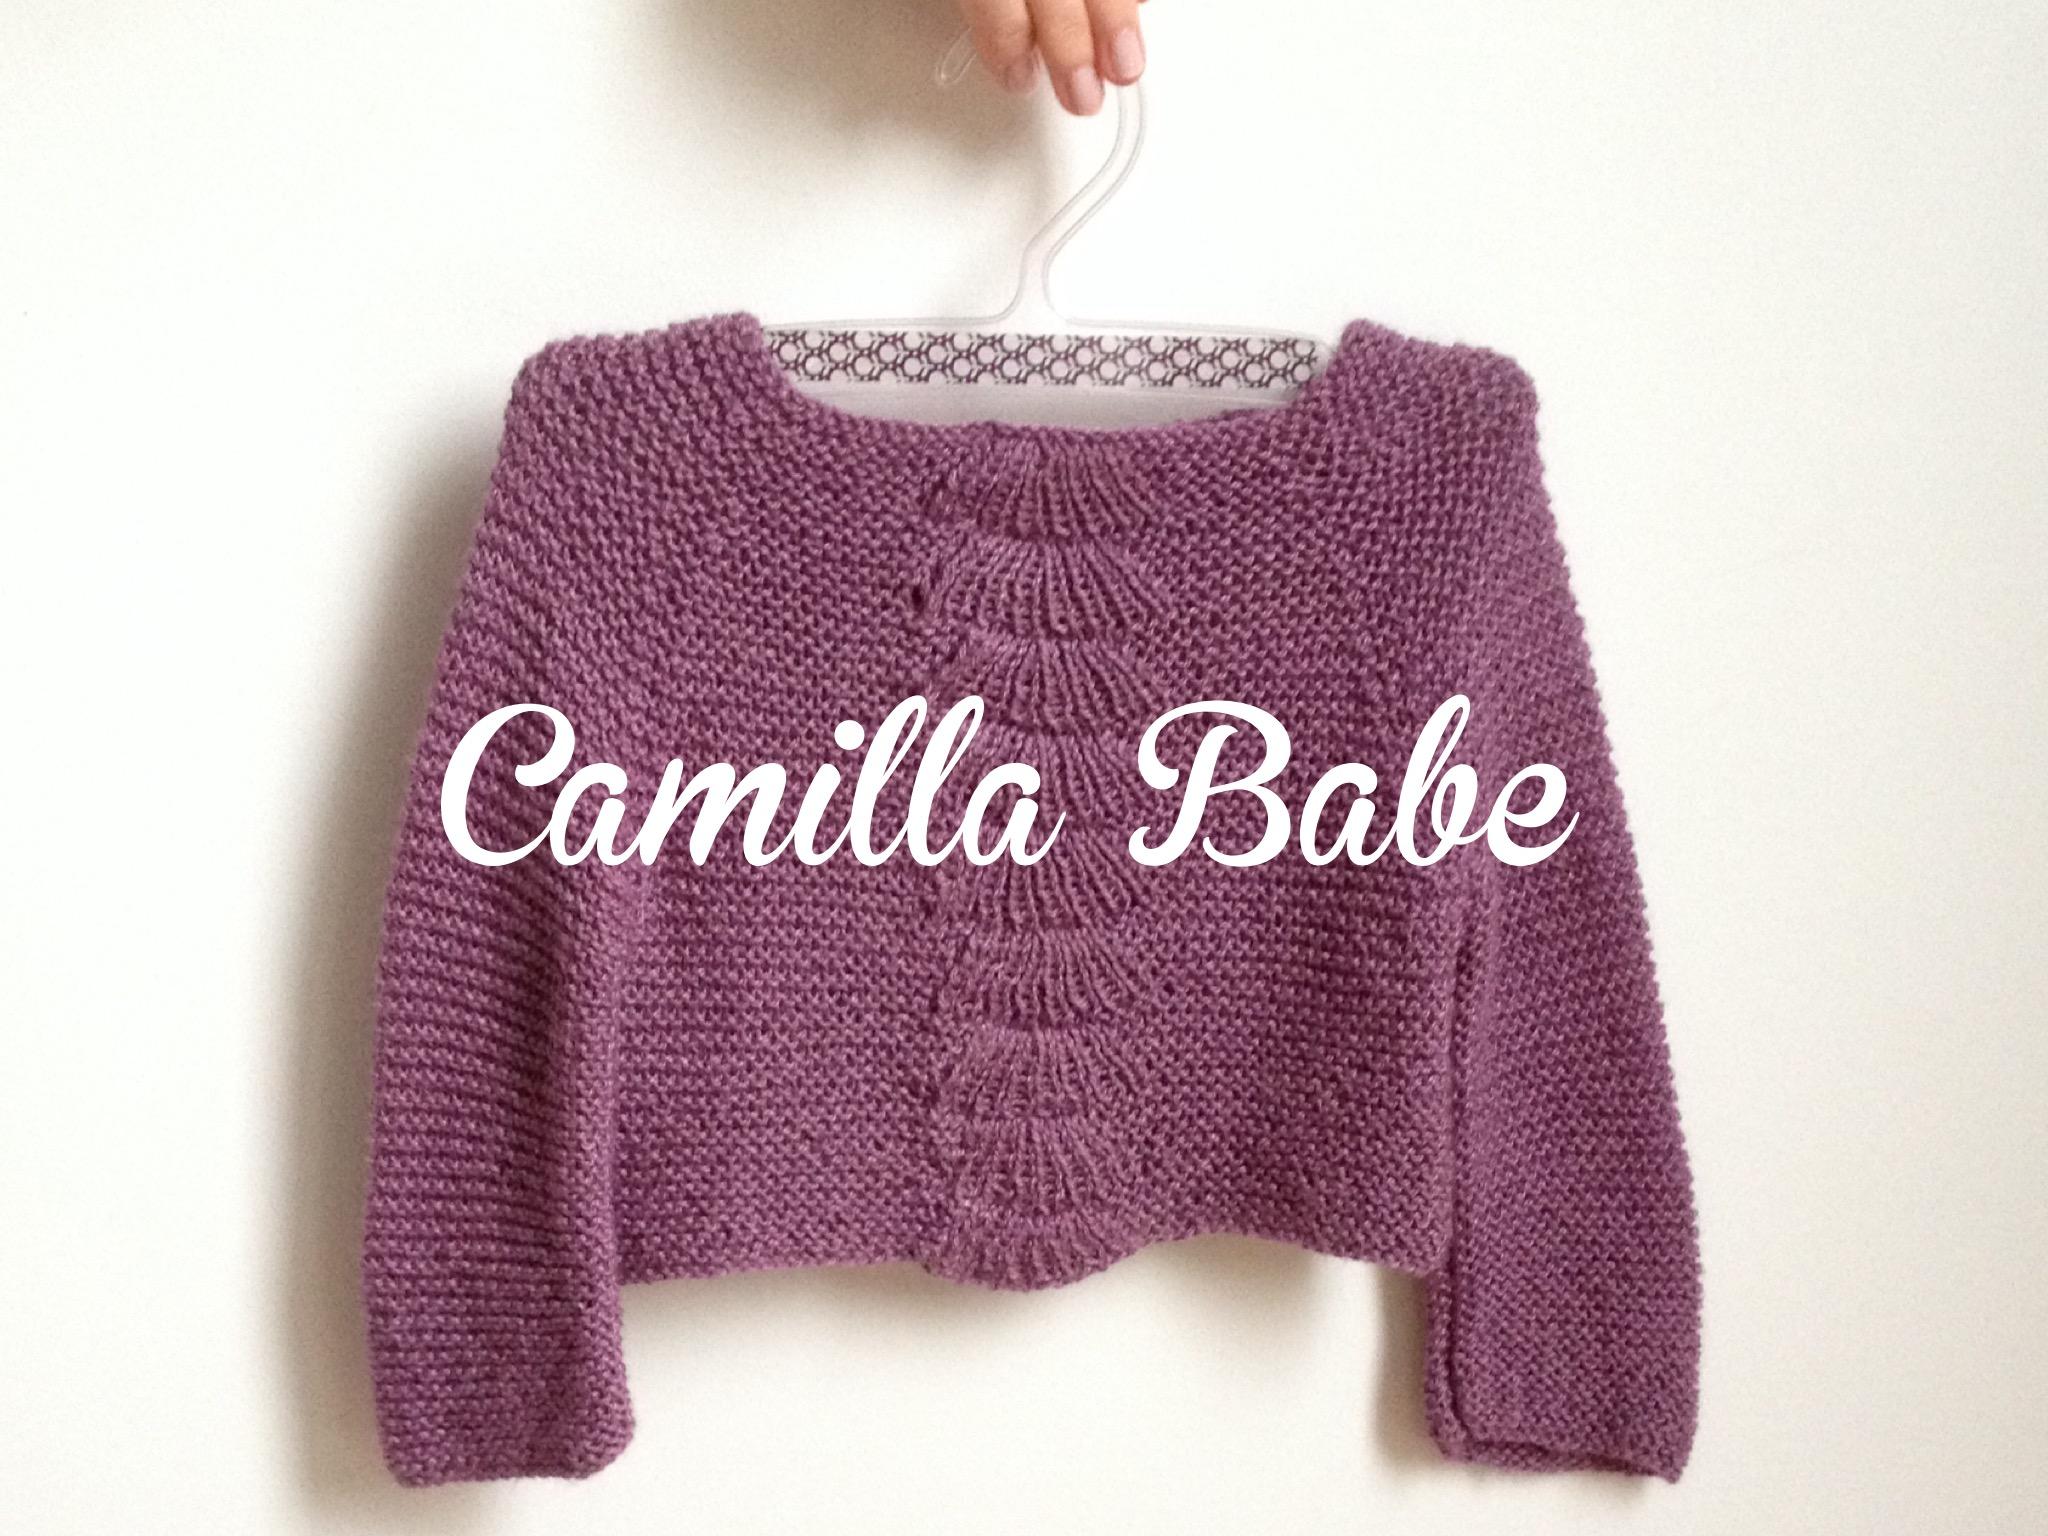 Camilla babe (cadeau handmade #2)